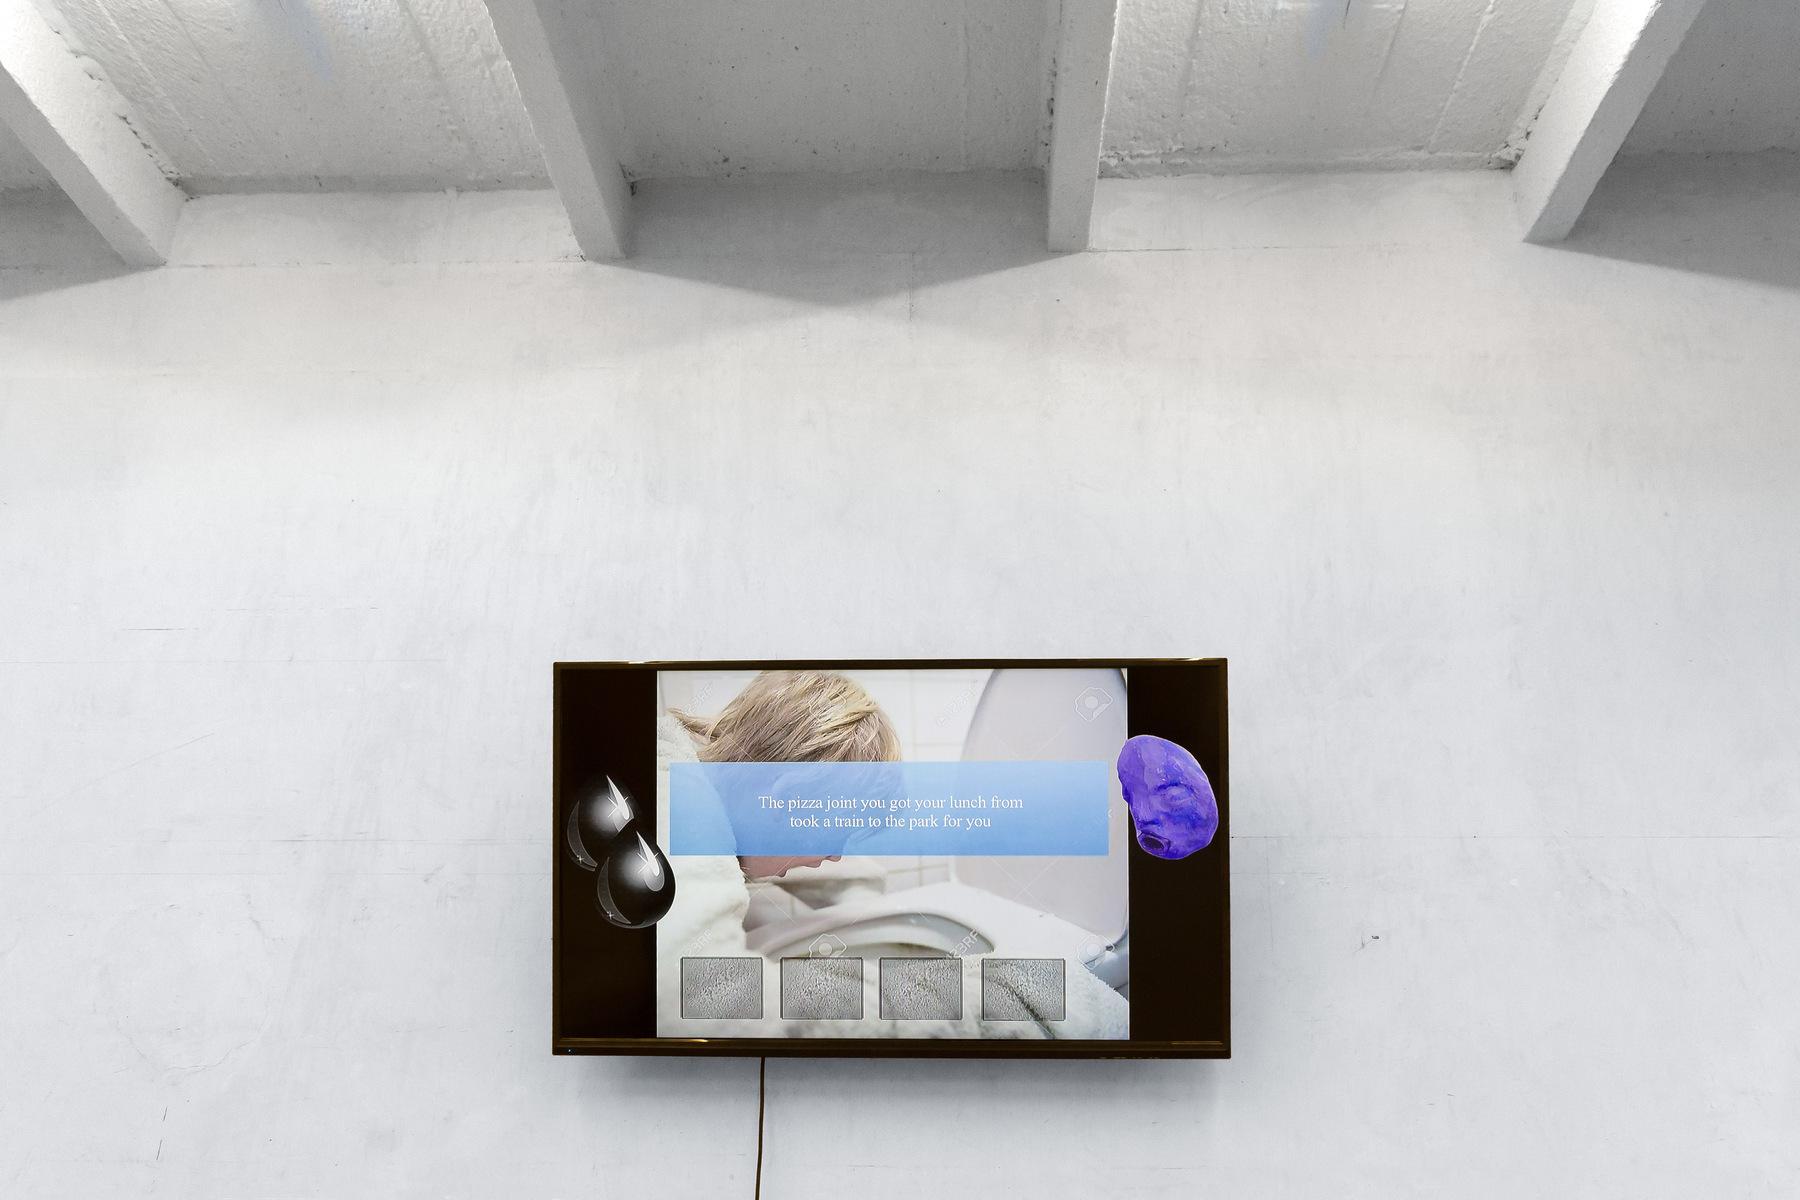 07-Pakui-Hardware-Fenetre-Project-Exo-Exo-Paris-Ugnius-Gelguda-Neringa-Cerniauskaite-Dustin-Cauchi-Francesca-Mangion